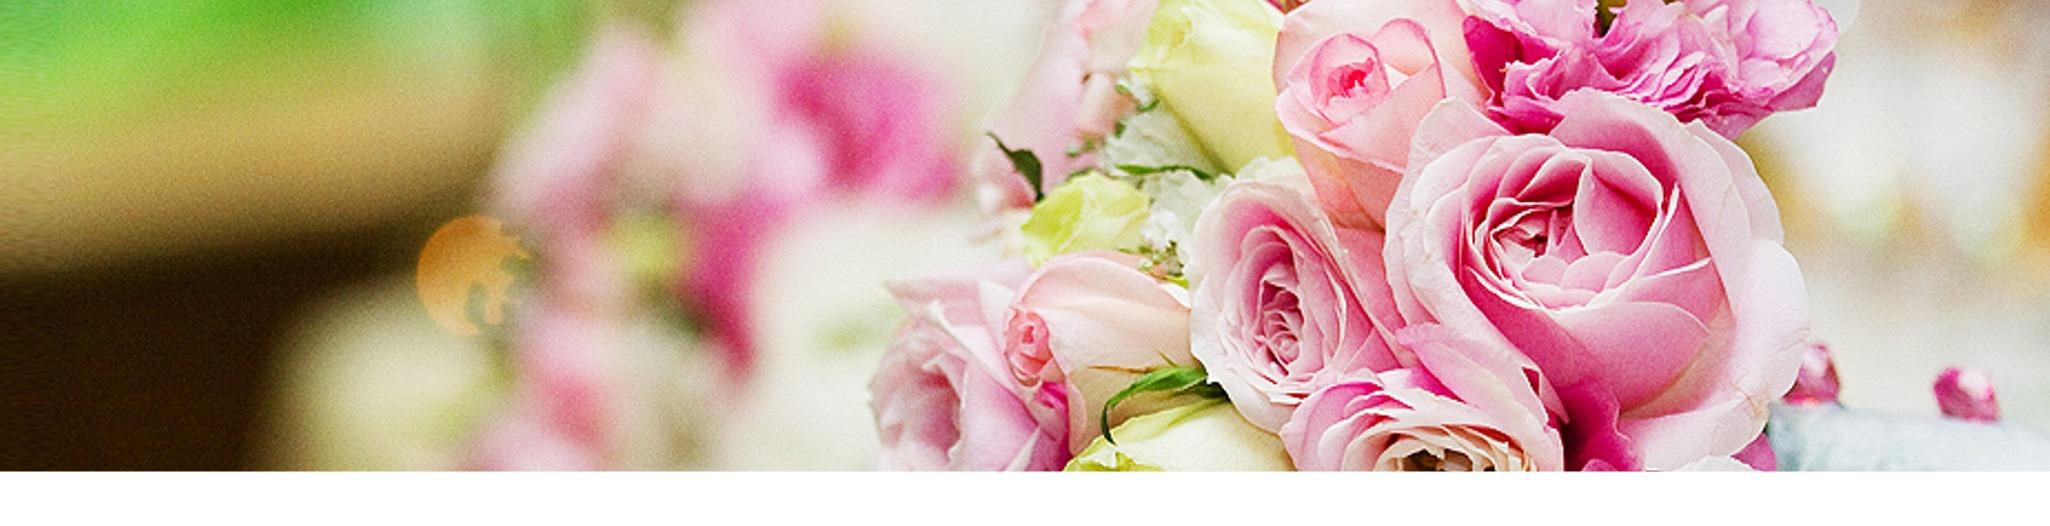 Overseasflowerdelivery international fresh flower delivery by overseasflowerdelivery international fresh flower delivery by worldwide florists network izmirmasajfo Choice Image